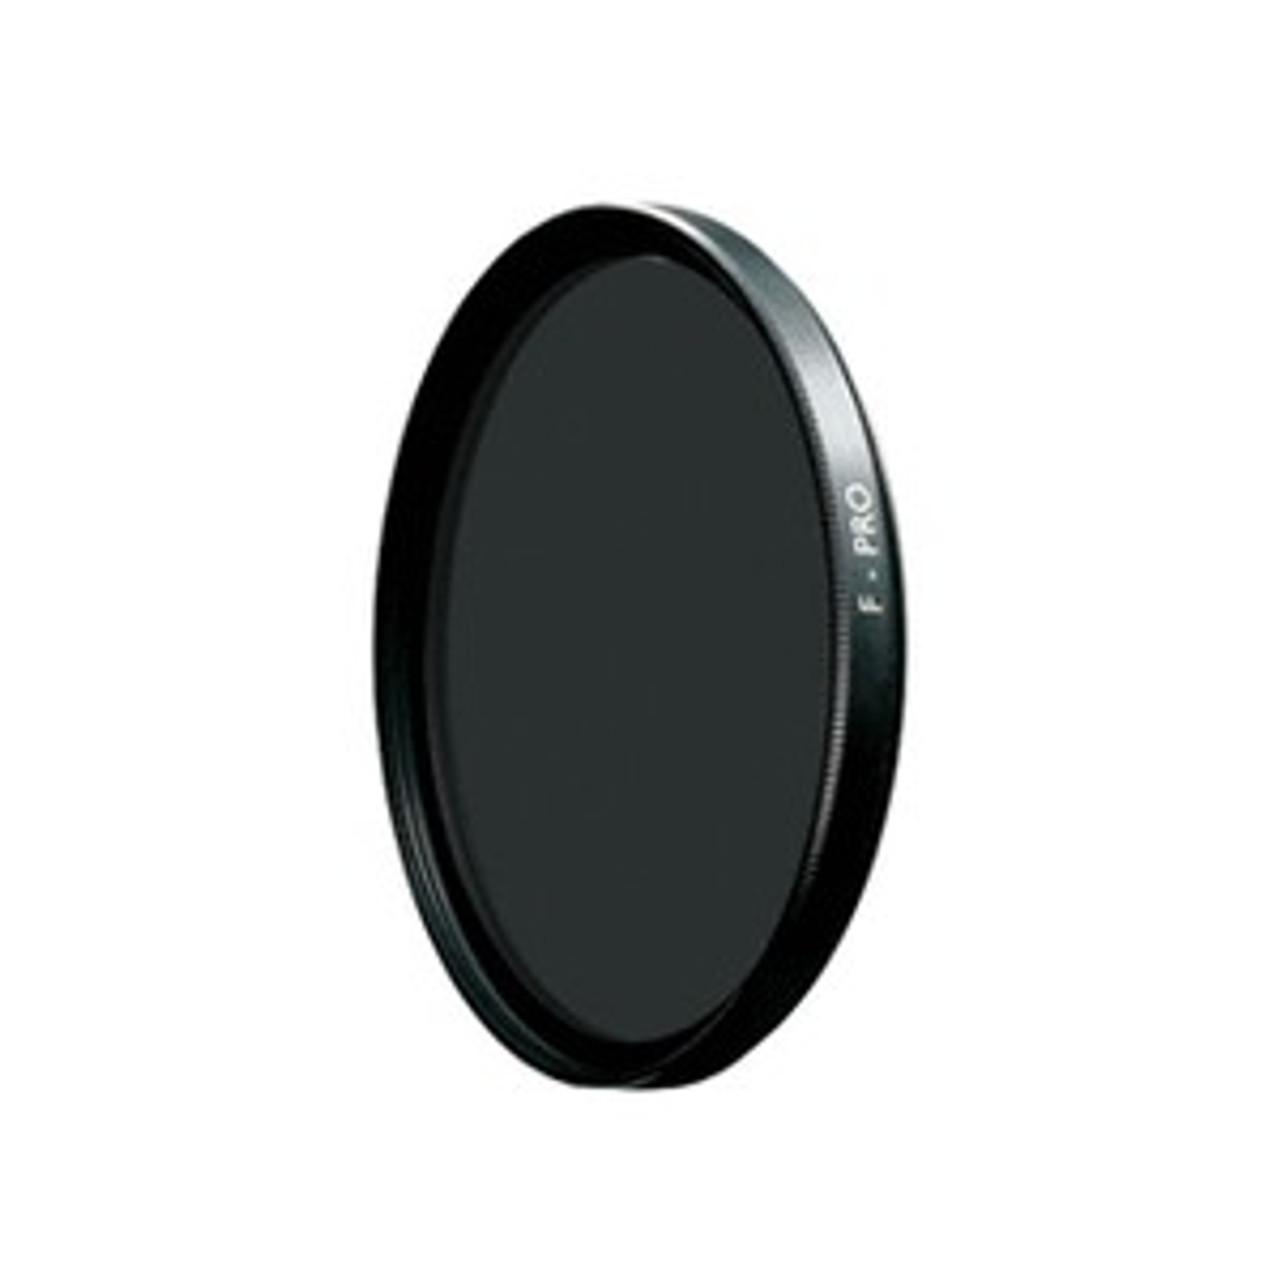 B+W 82mm ND 3.0 1000X Filter